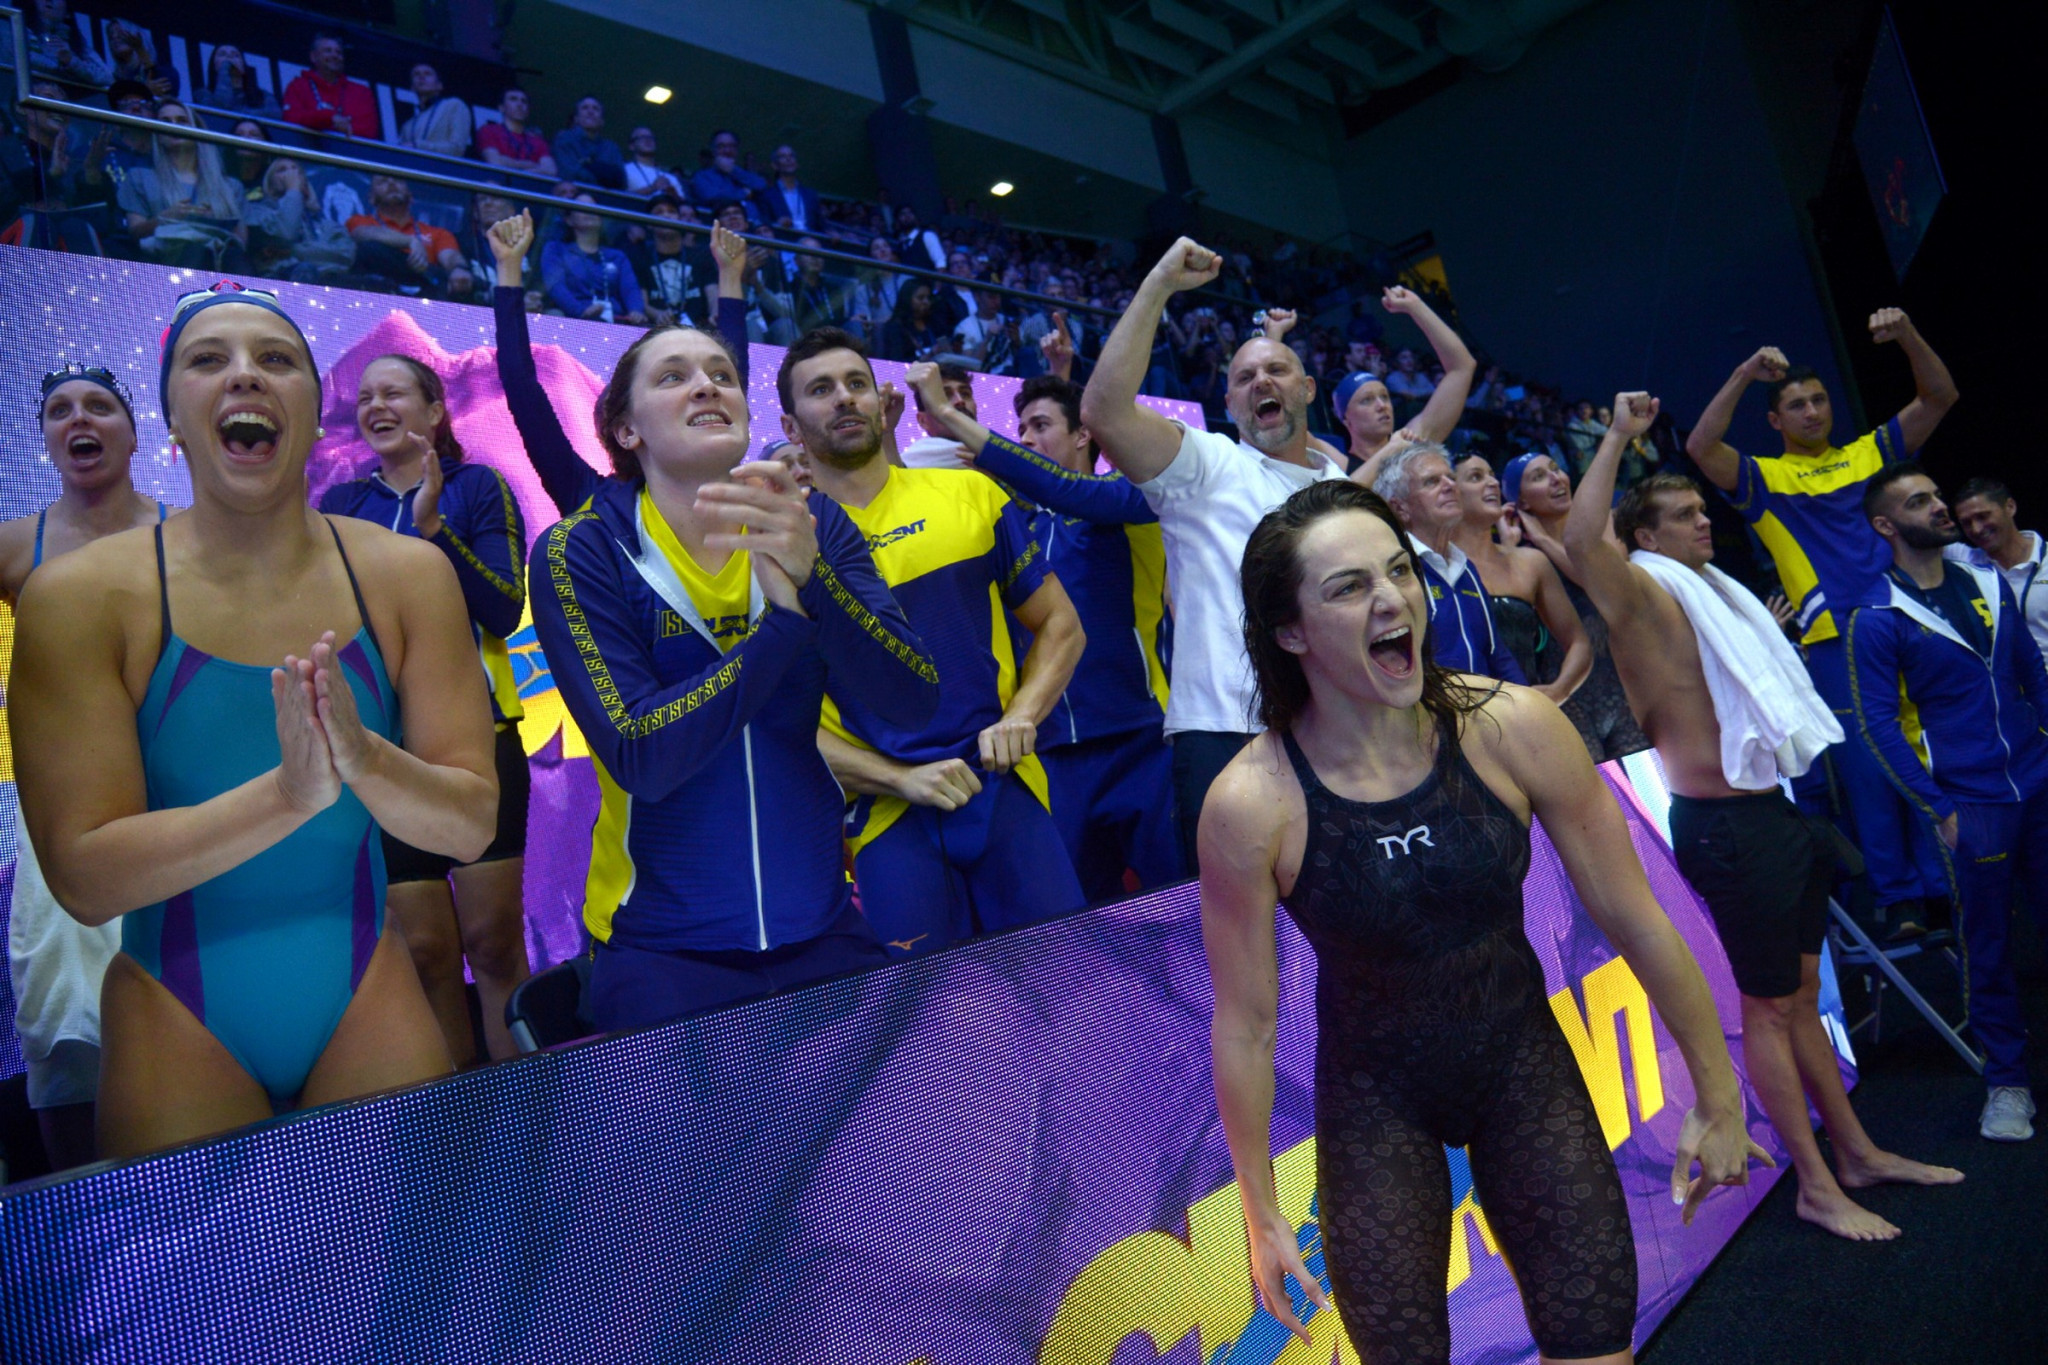 Gastaldello seals American derby win for LA Current at International Swimming League